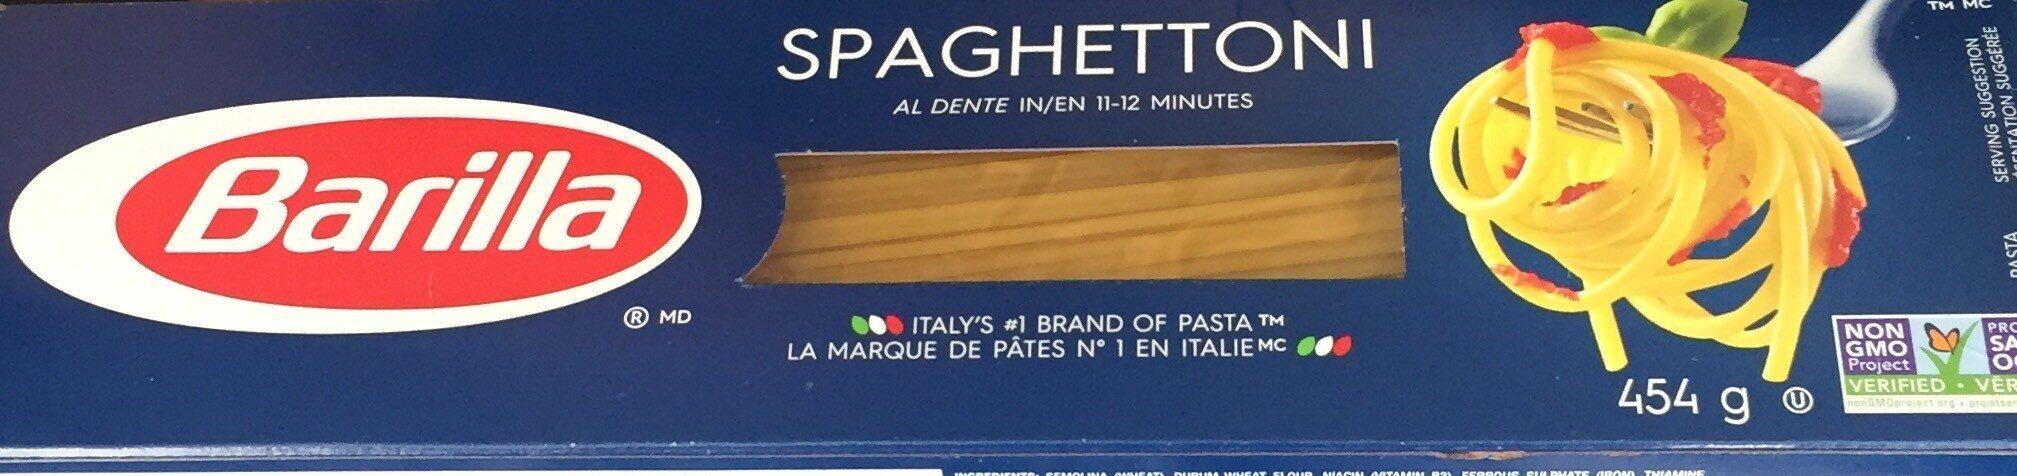 Spaghettoni n. 7 - Product - en